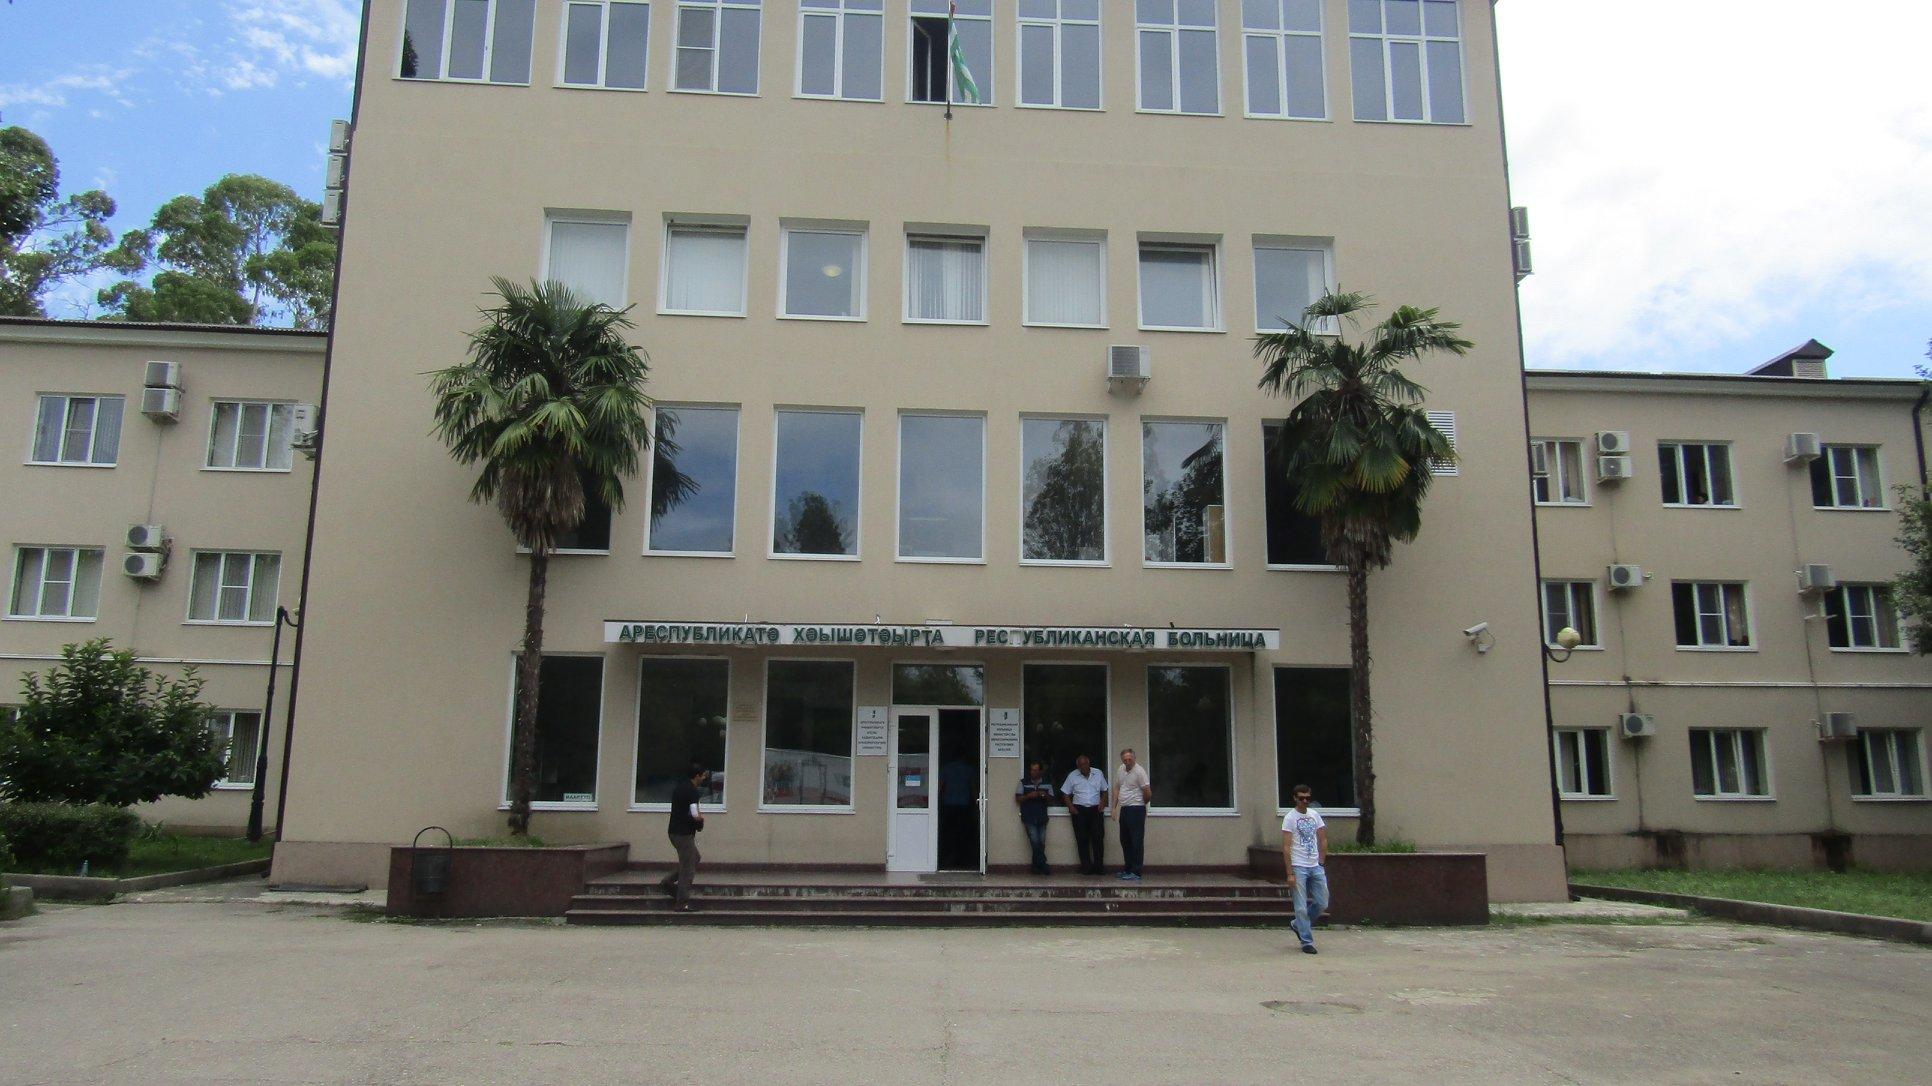 Abkhazia Helth #новости Абхазия, коронавирус, Отар Бердзенишвили, Южная Корея